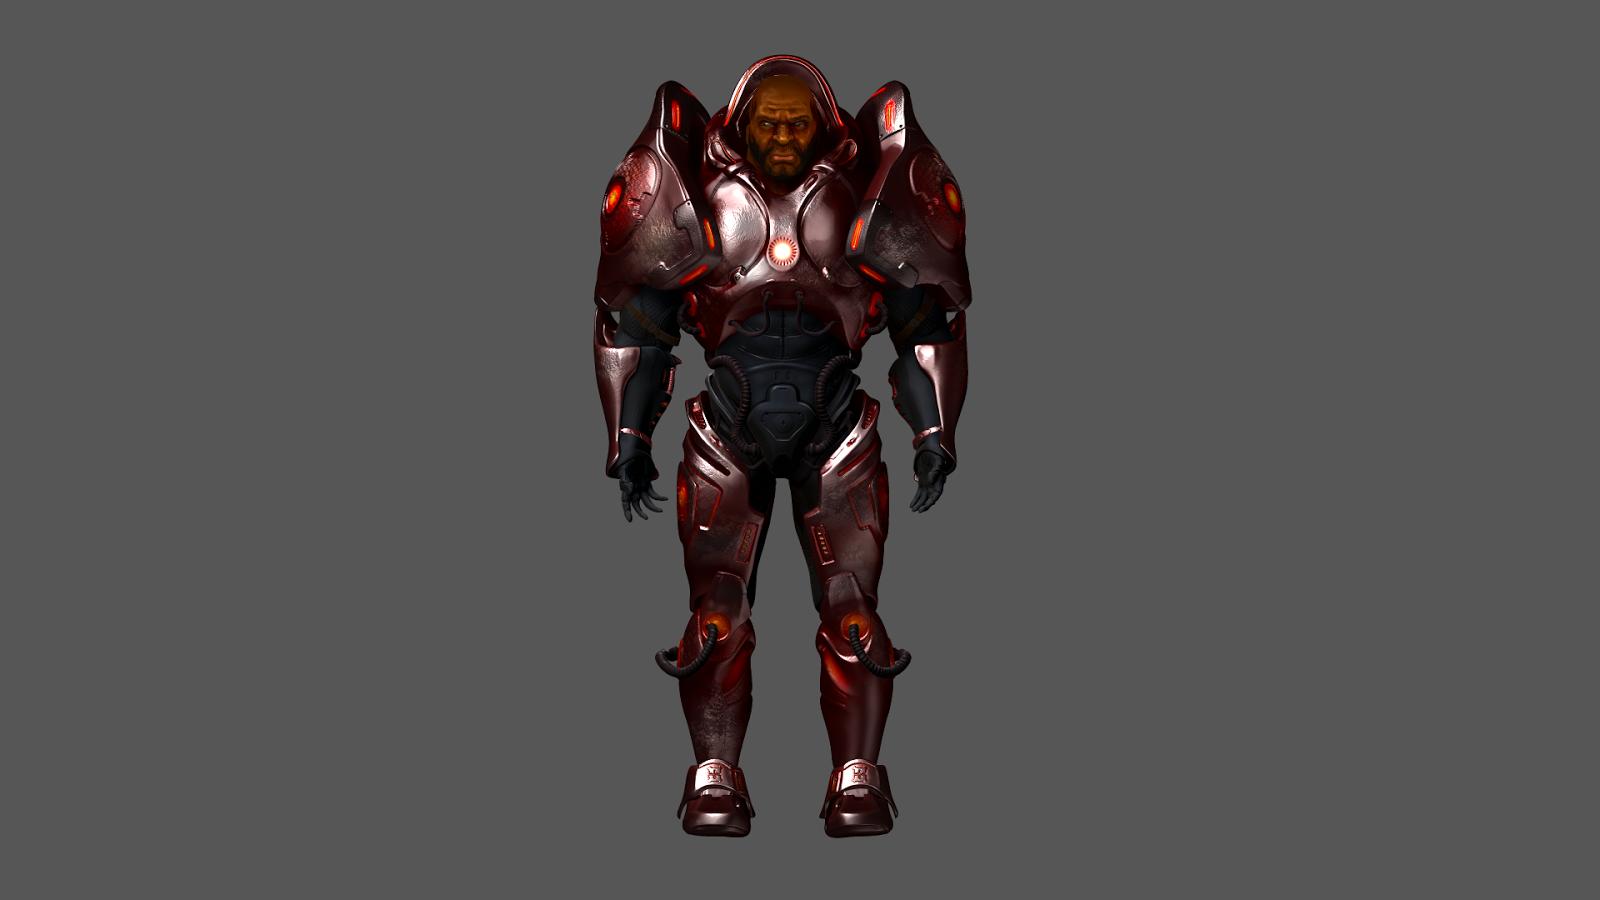 space suit new design - photo #29